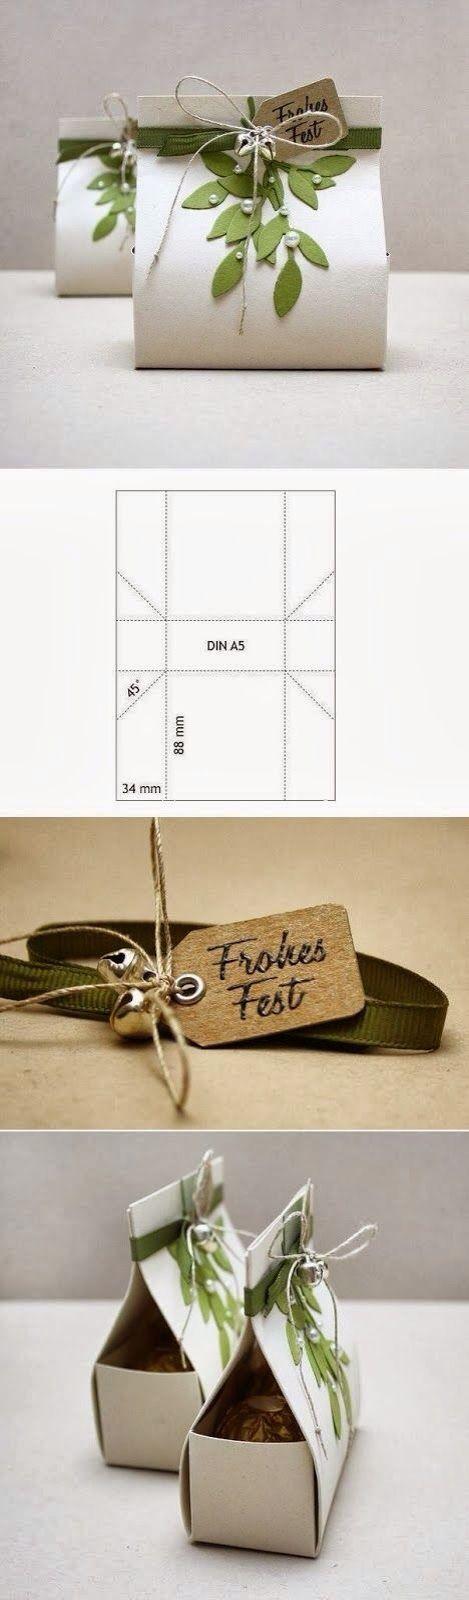 Easy gift box!